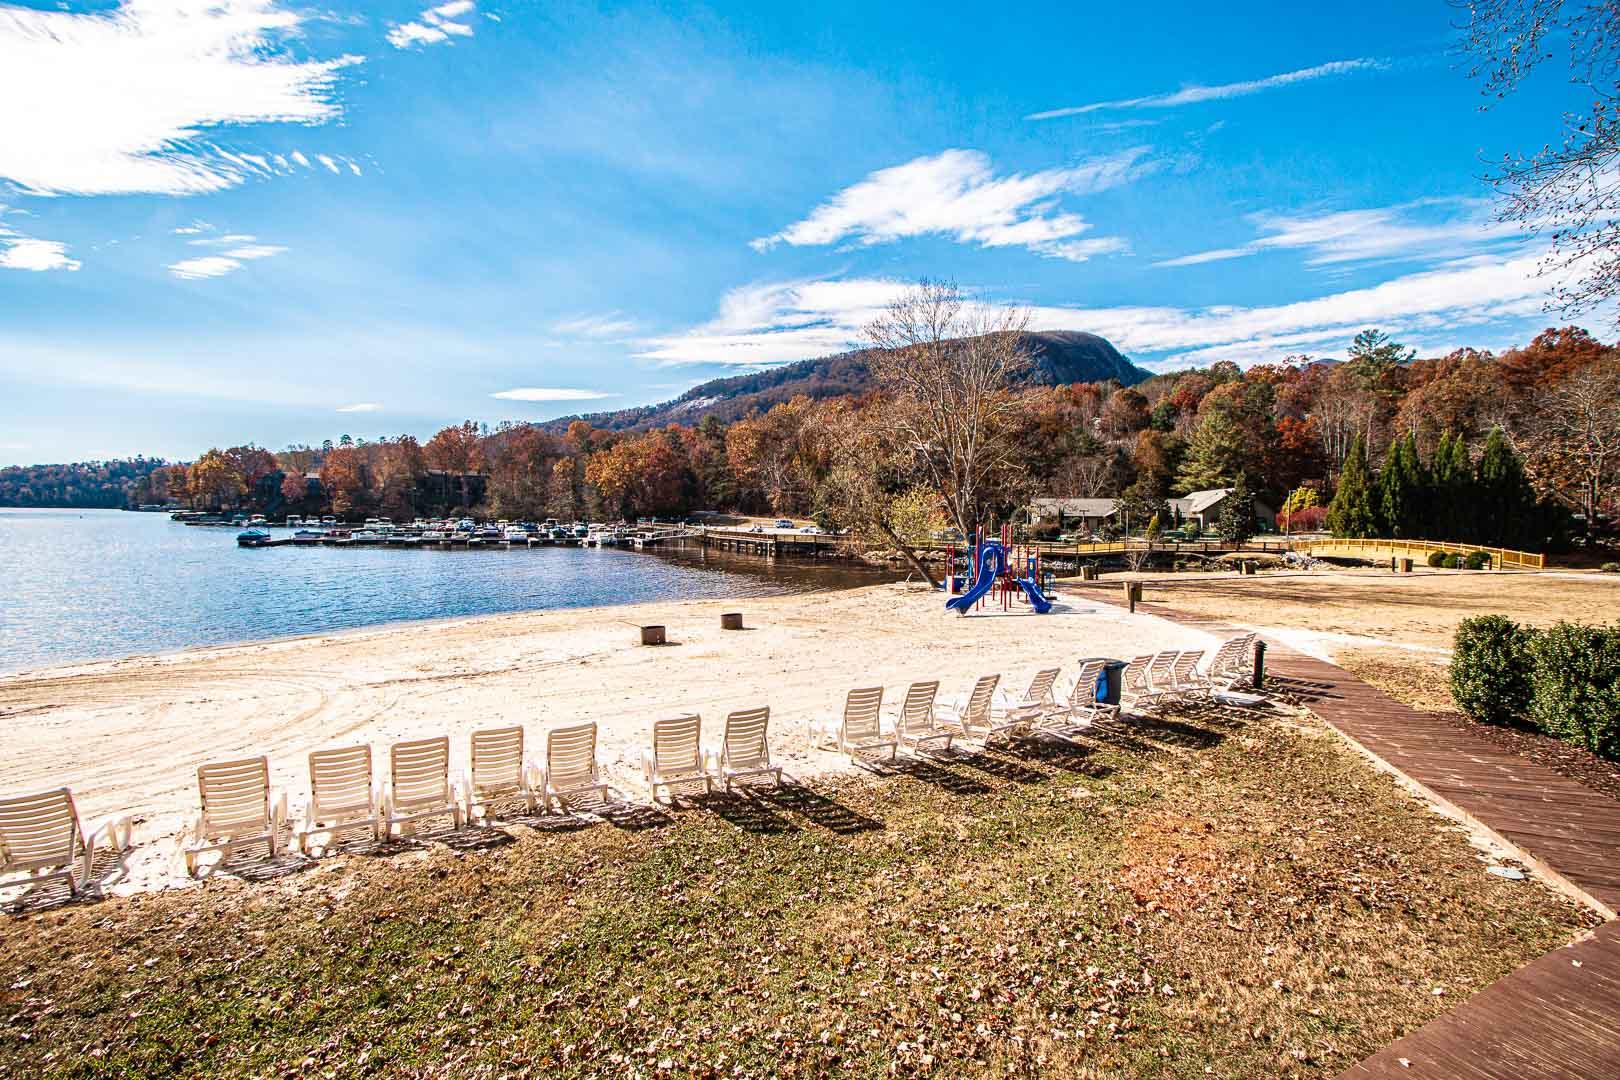 A breathtaking view from the lake at VRI's Fox Run Resort in North Carolina.